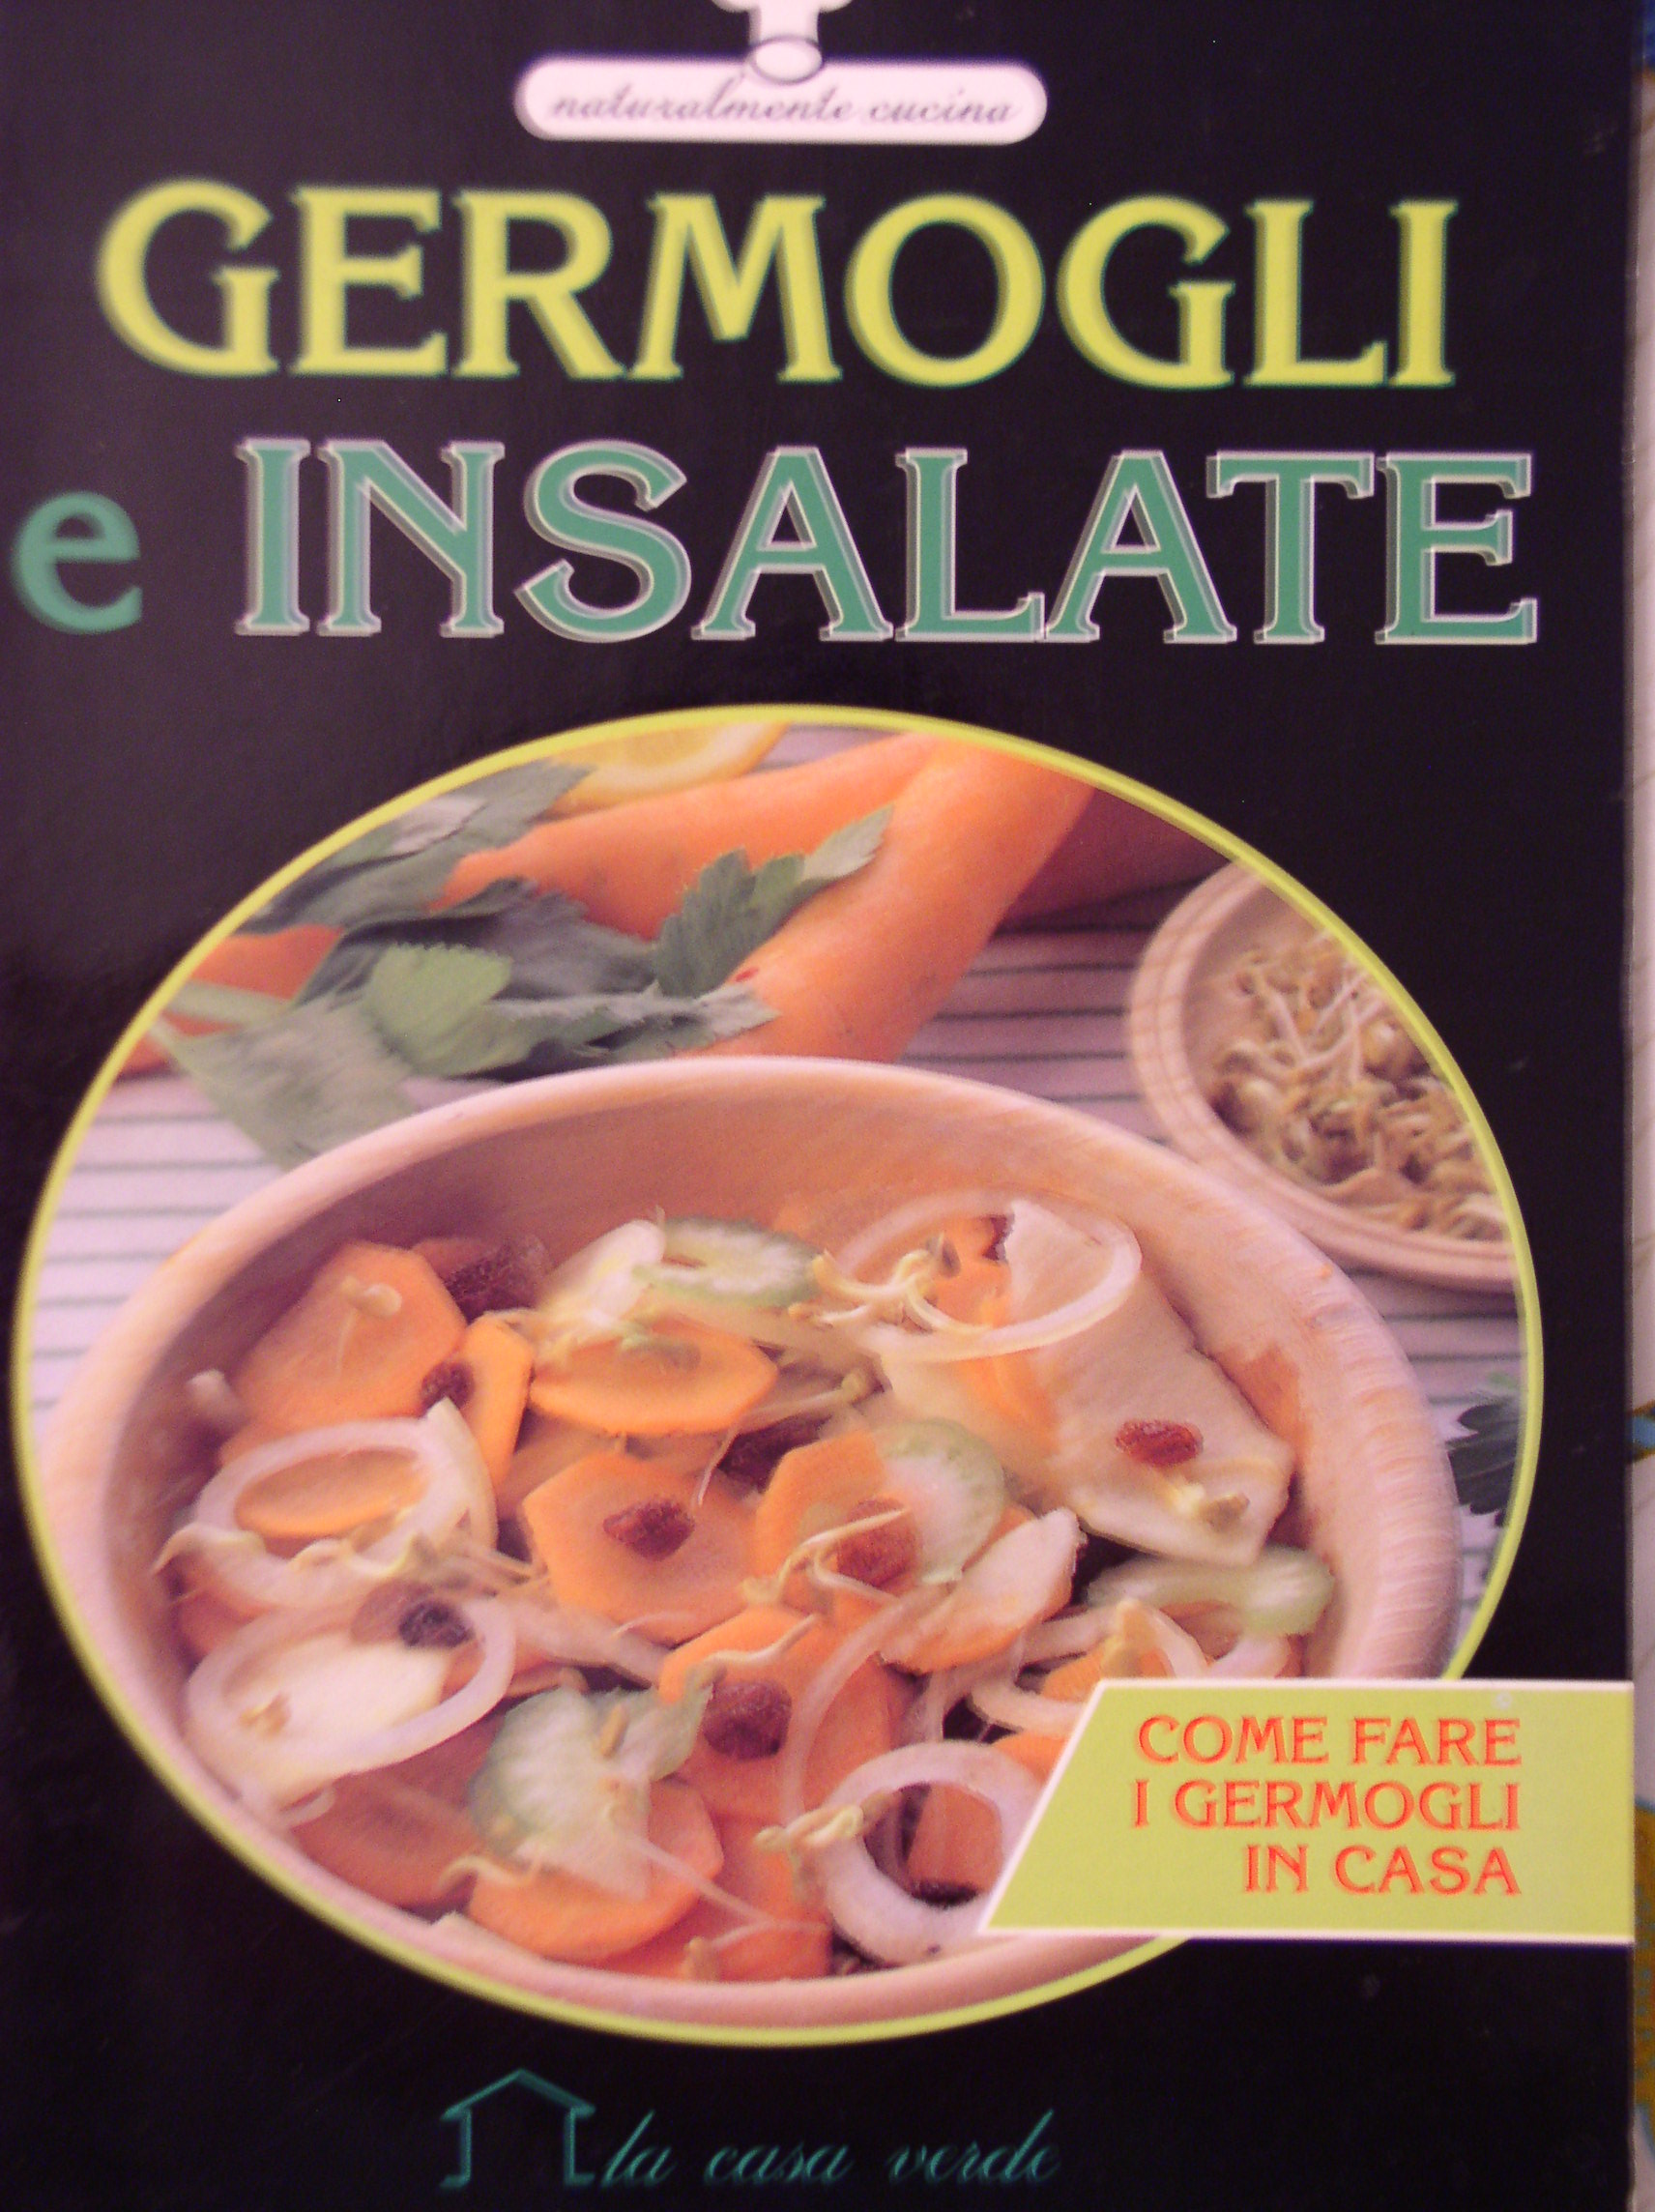 Germogli e insalate